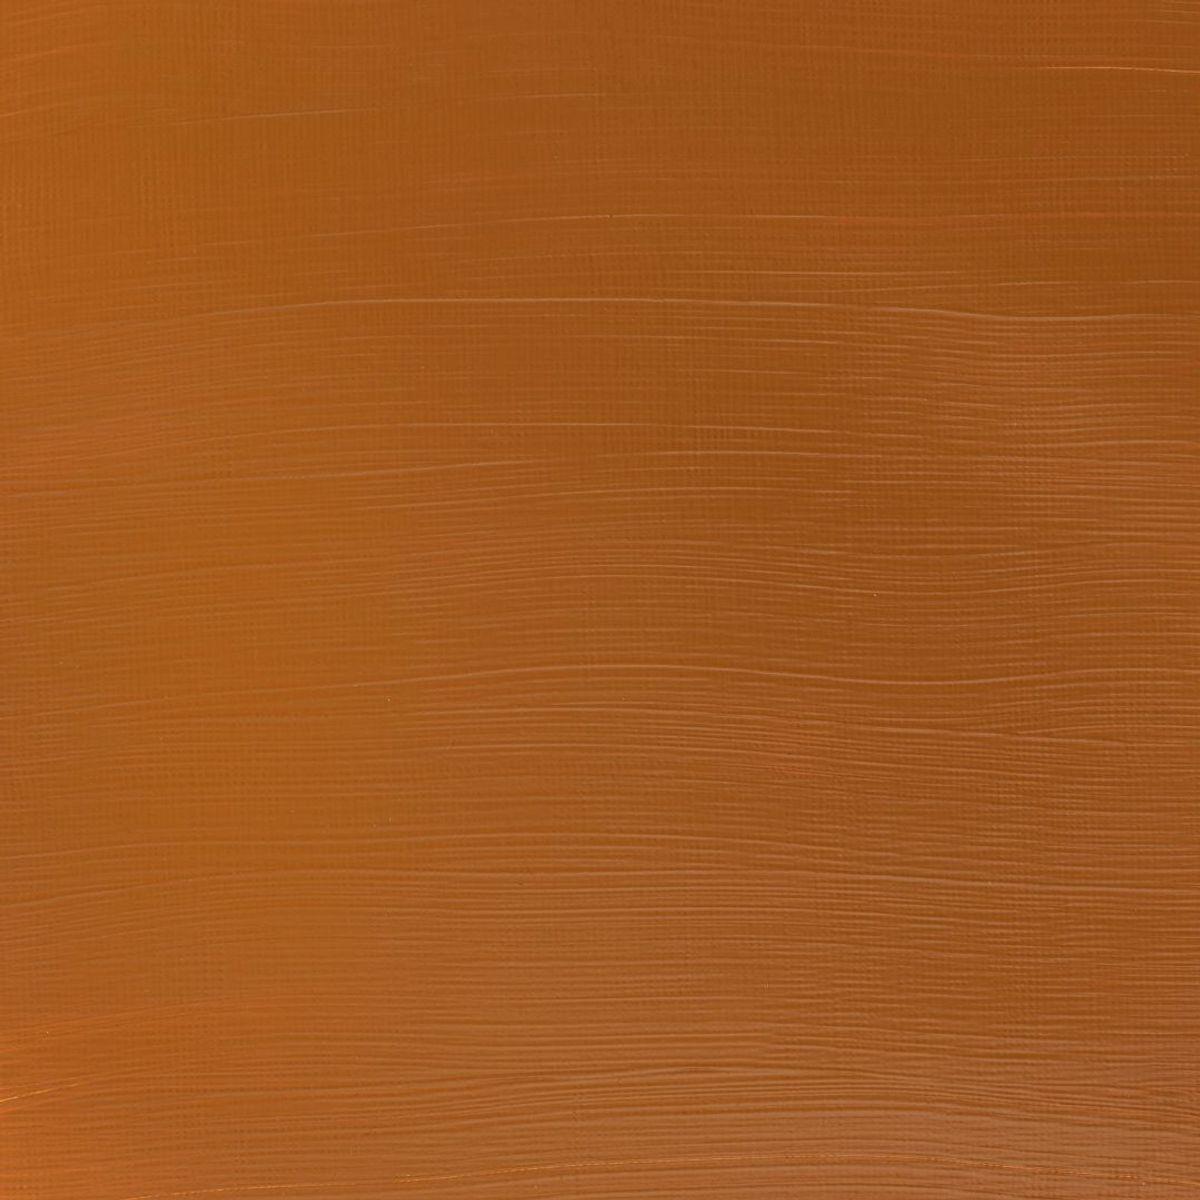 WINSOR AND NEWTON GALERIA ACRYLIC COLOUR - TUBE OF 60 ML - RAW SIENNA OPAQUE (553)